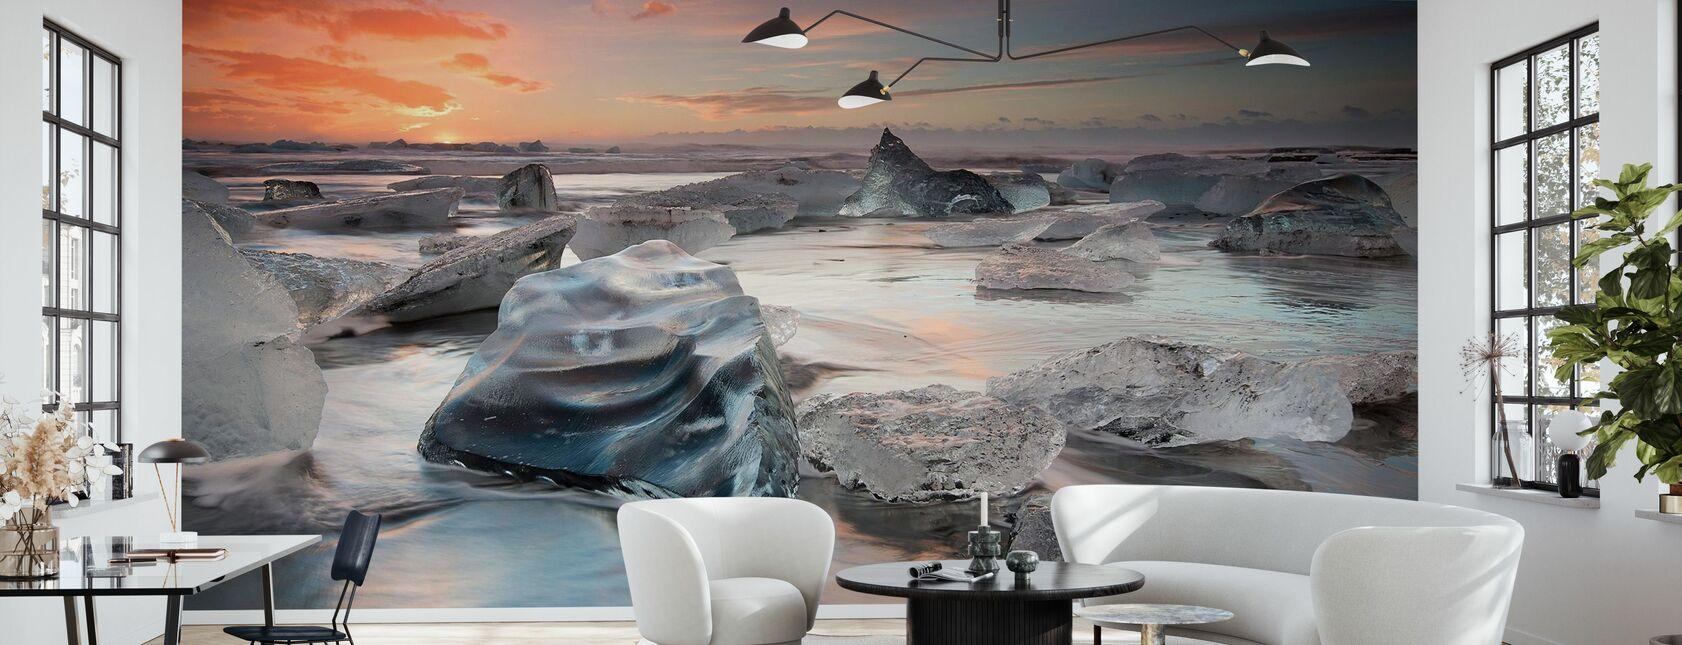 Glacial Lagoon Beach - Wallpaper - Living Room